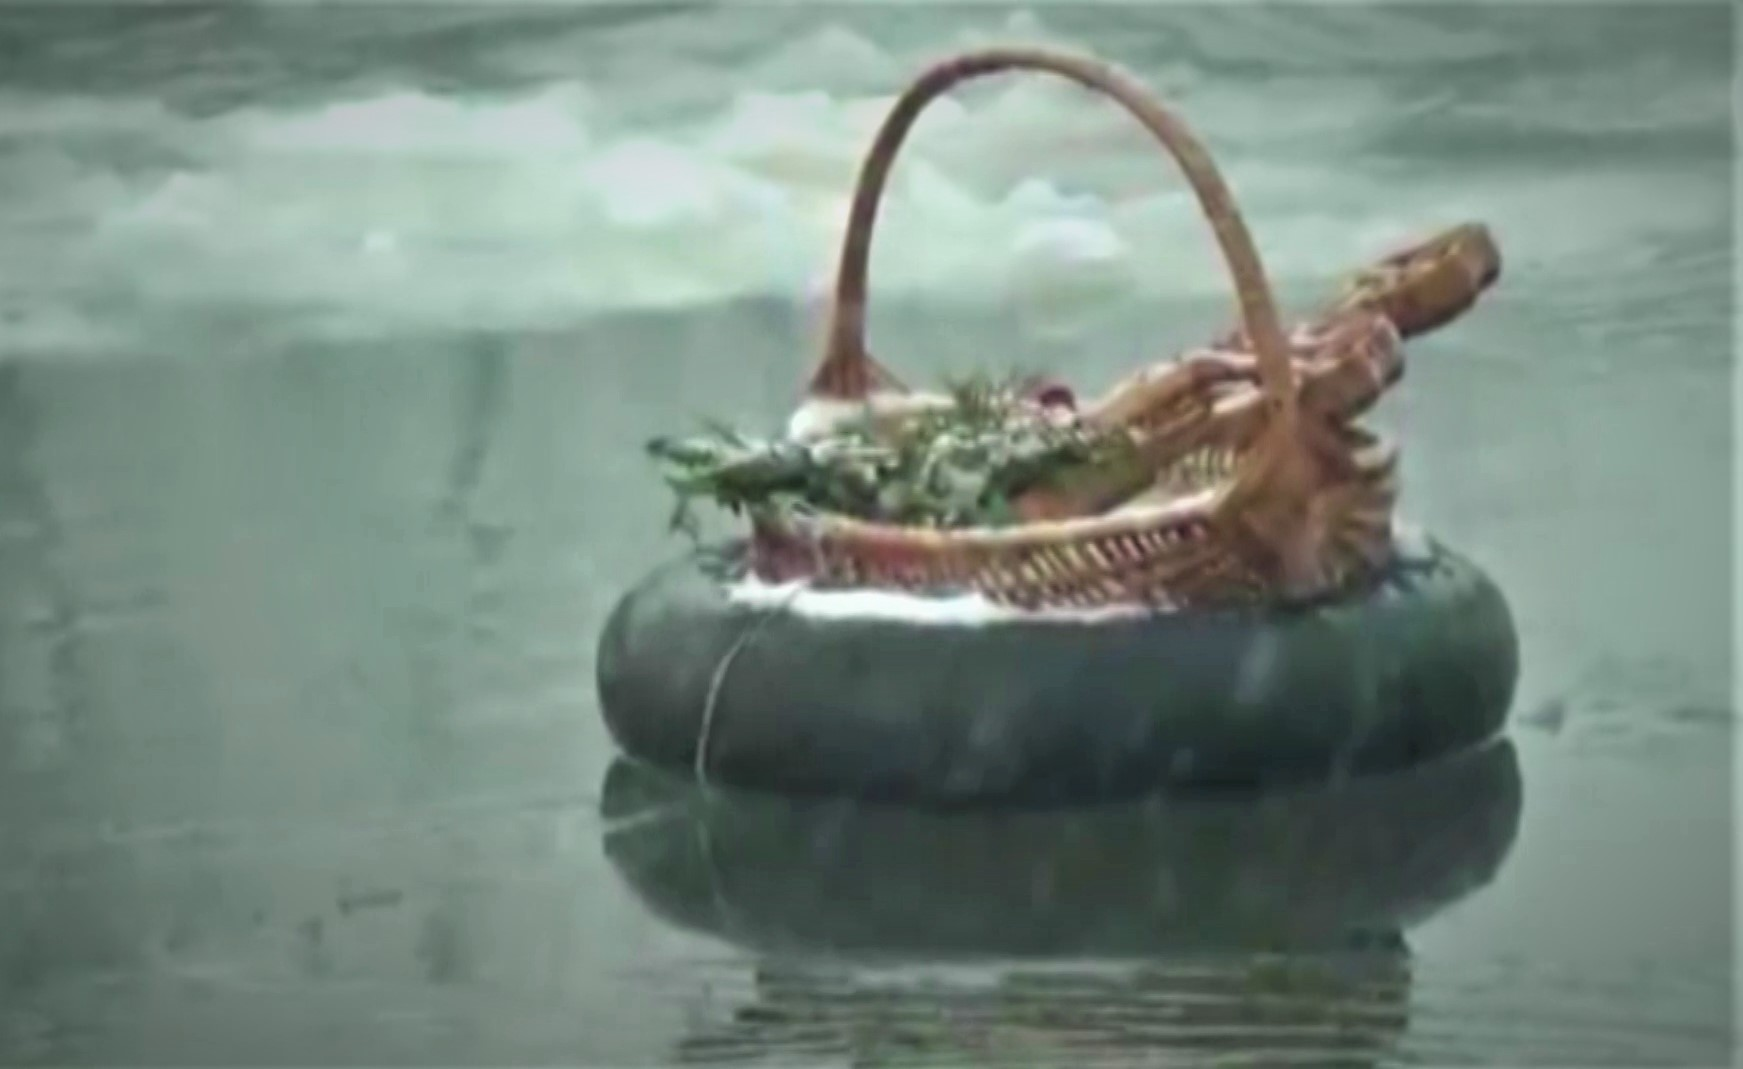 Eparhija Kruševačka blagoslovila dve plivačke viteške trke za Časni krst